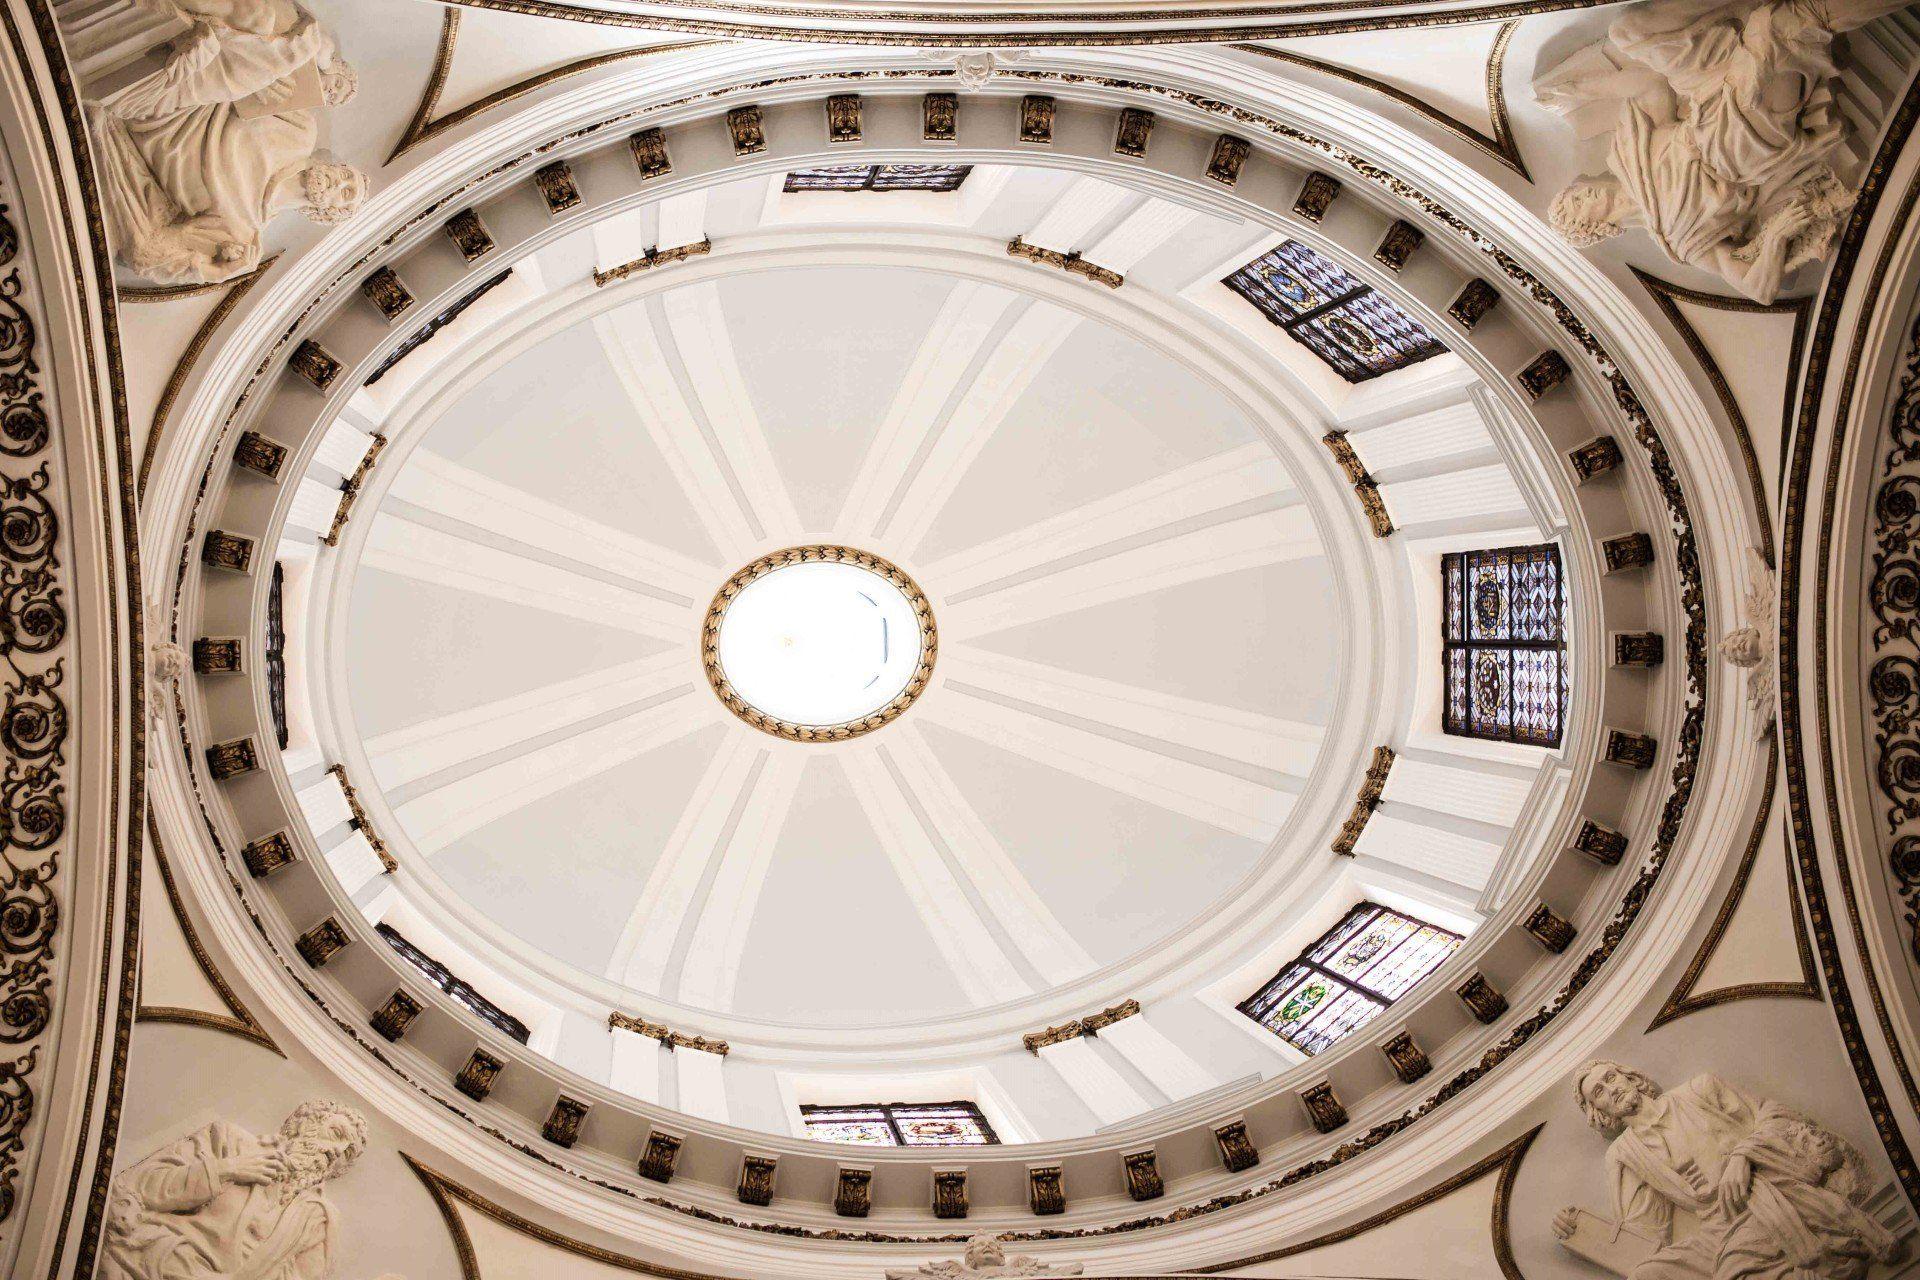 La luz, vital para la arquitectura religiosa